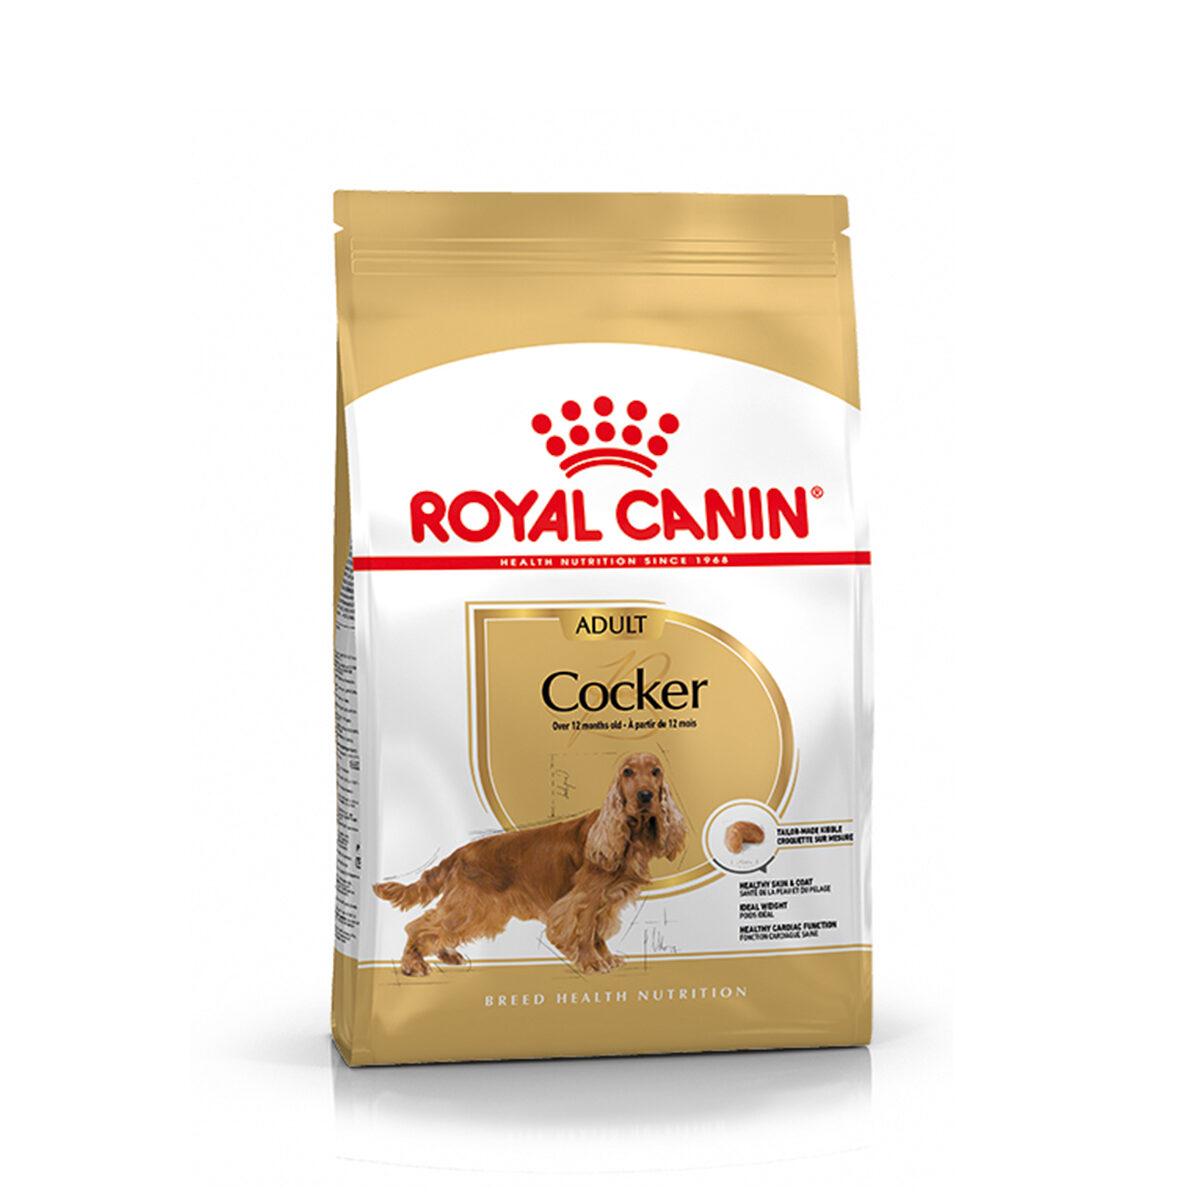 Royal Canin Cocker Hondenvoer Adult 3kg